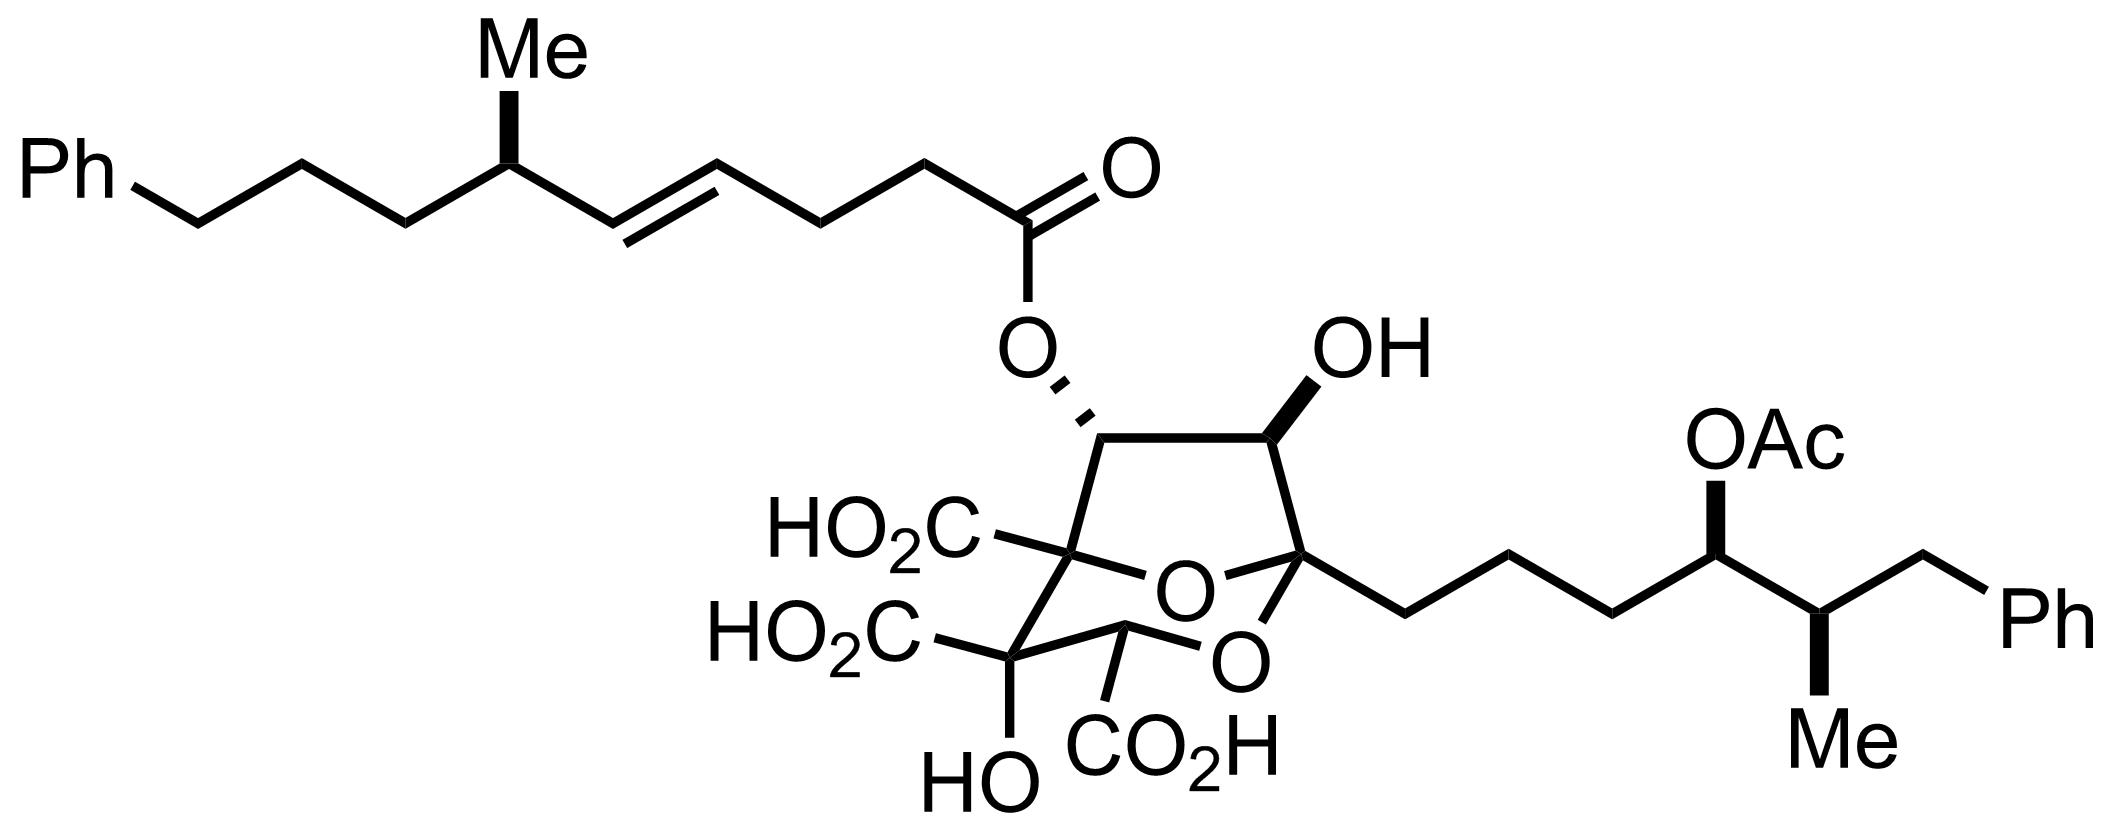 Structure of Zaragozic Acid C